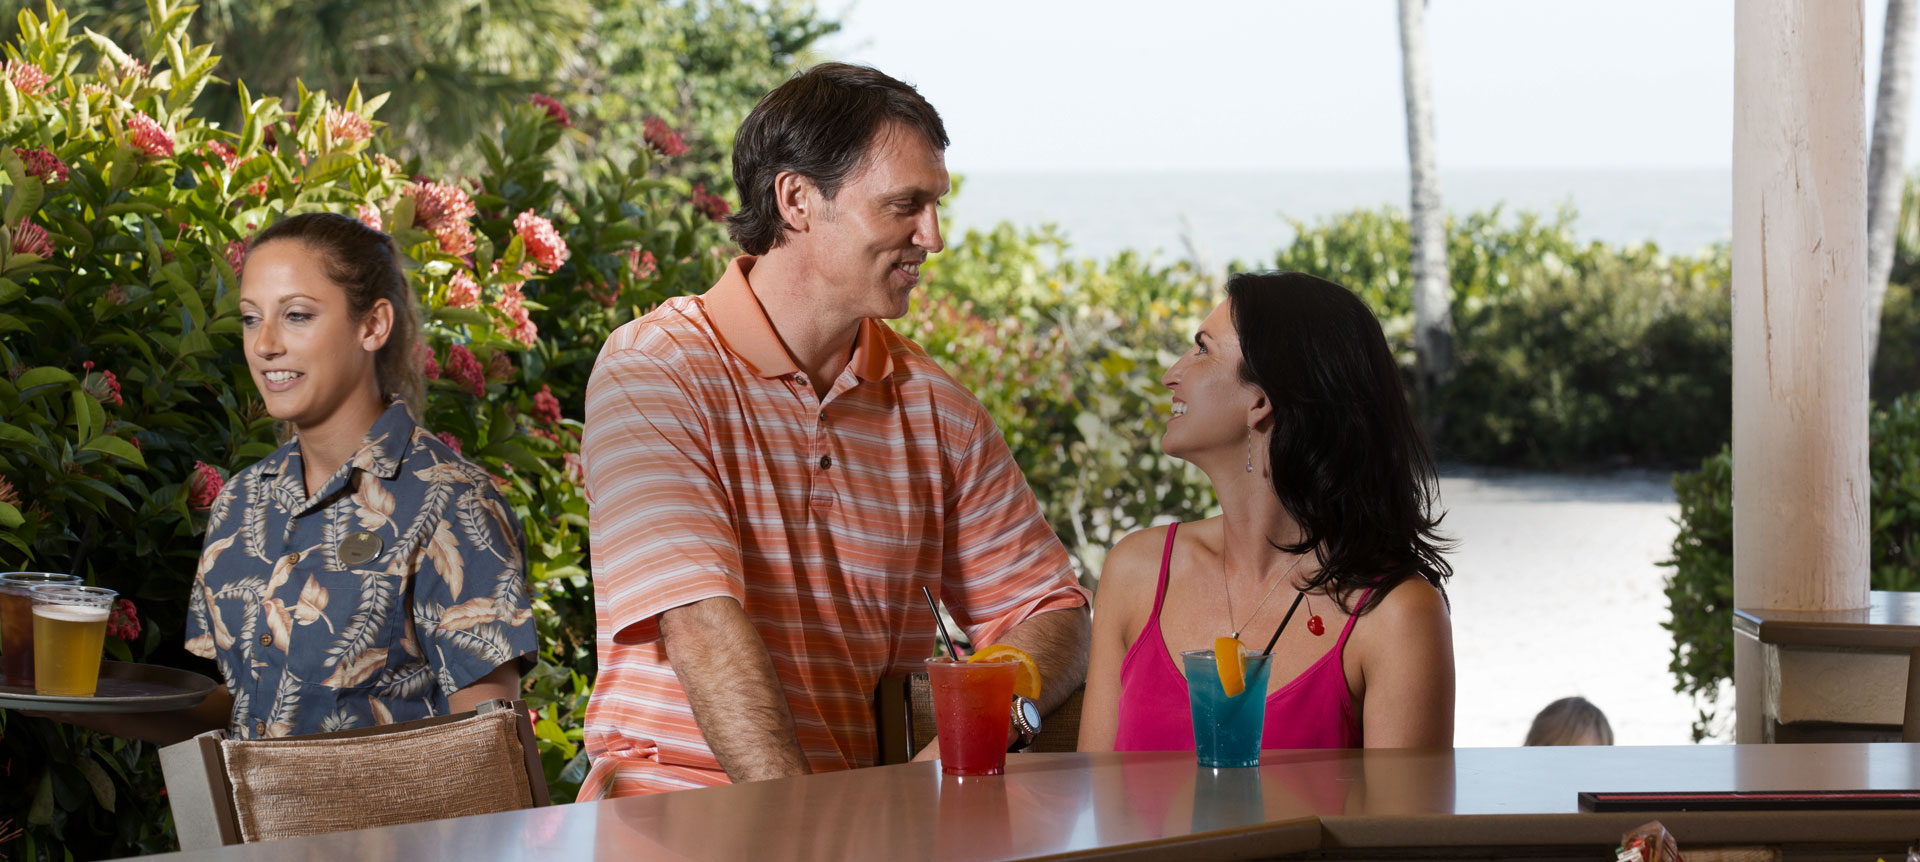 Sundial Beach Resort & Spa, Turtle's Pool & Beach Bar